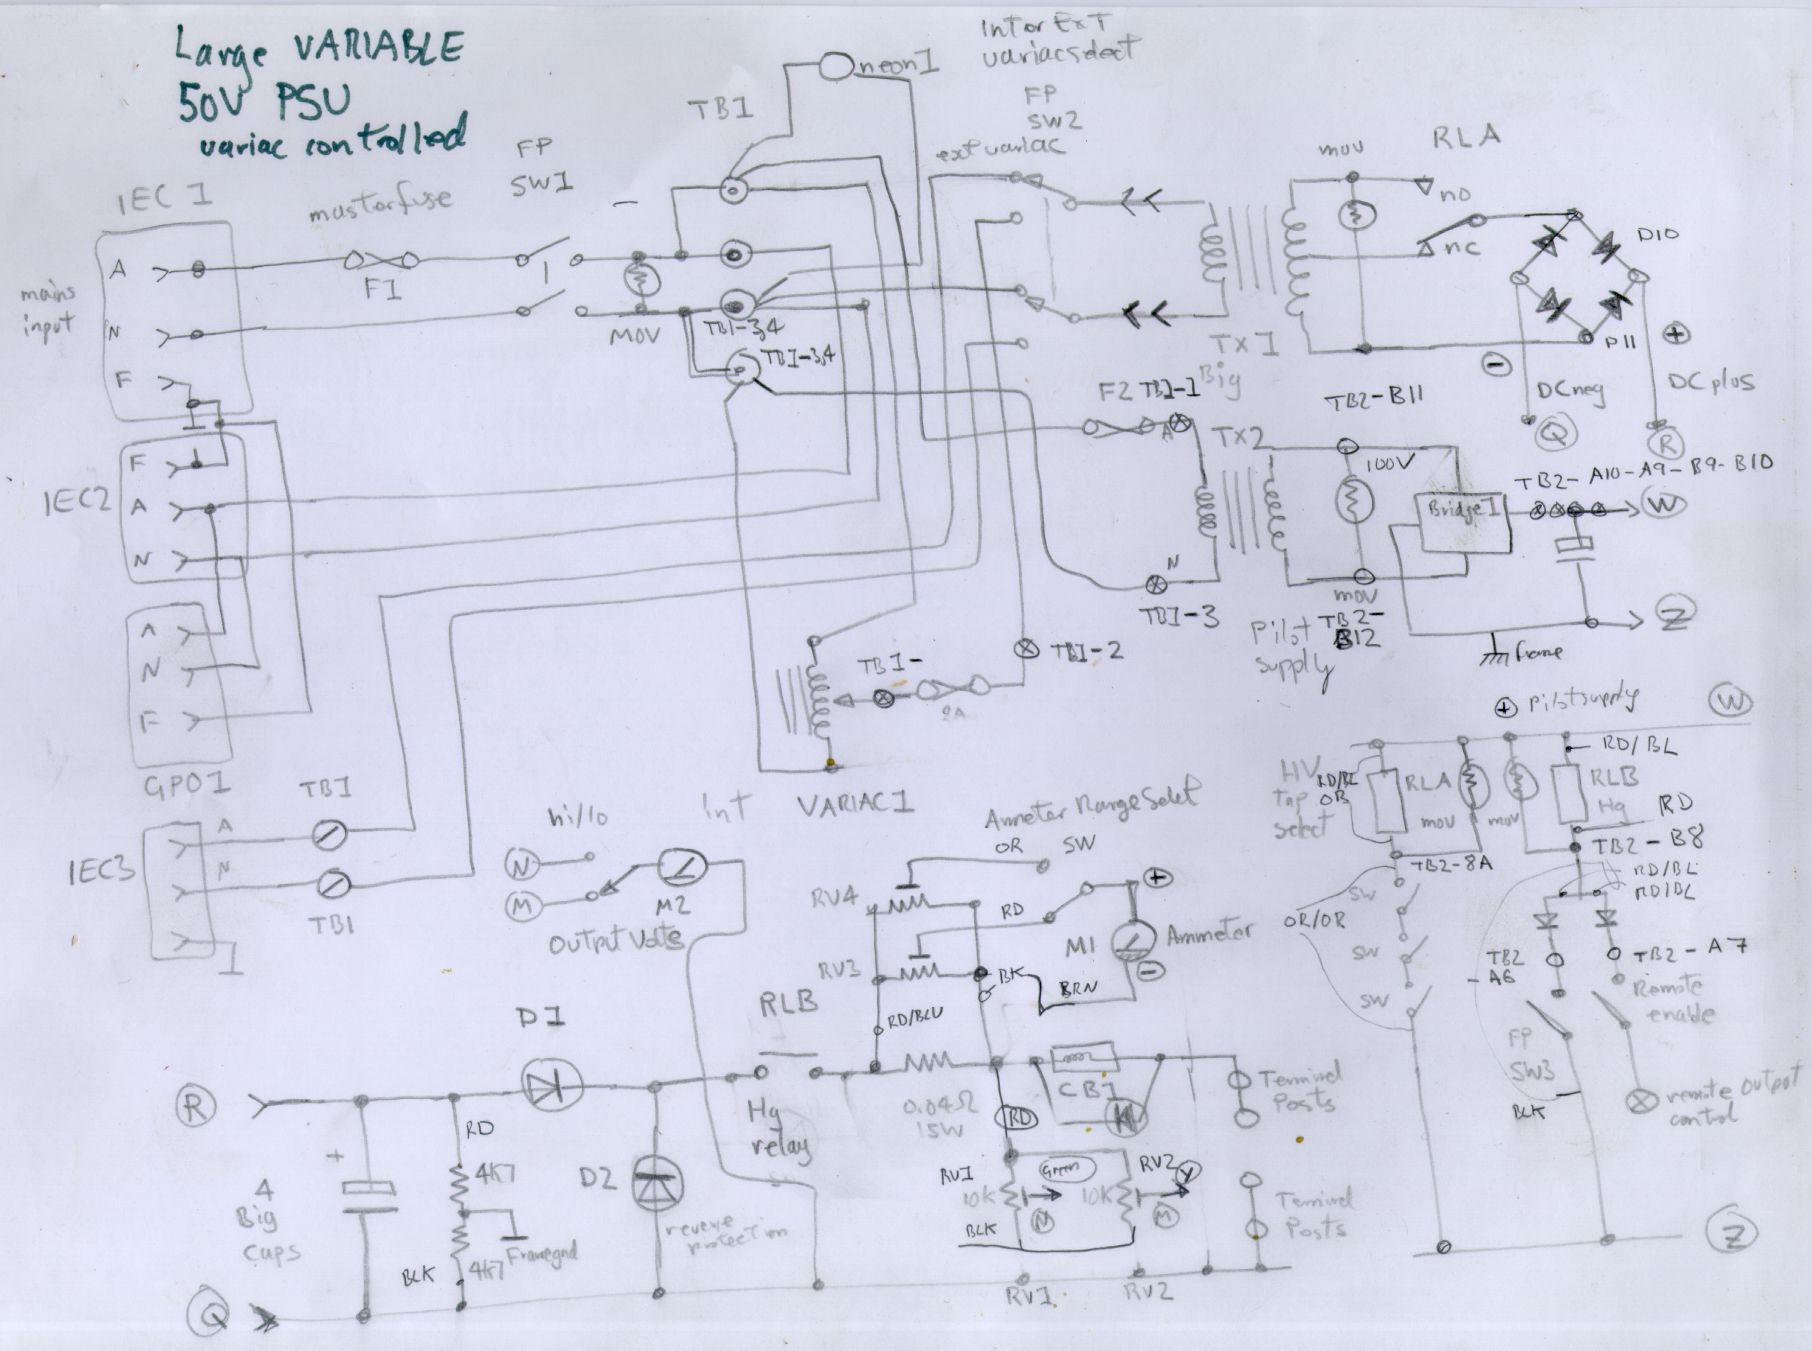 Psu Variac Variable Dc Power Supply Circuit Project Large 50v 2008jpeg